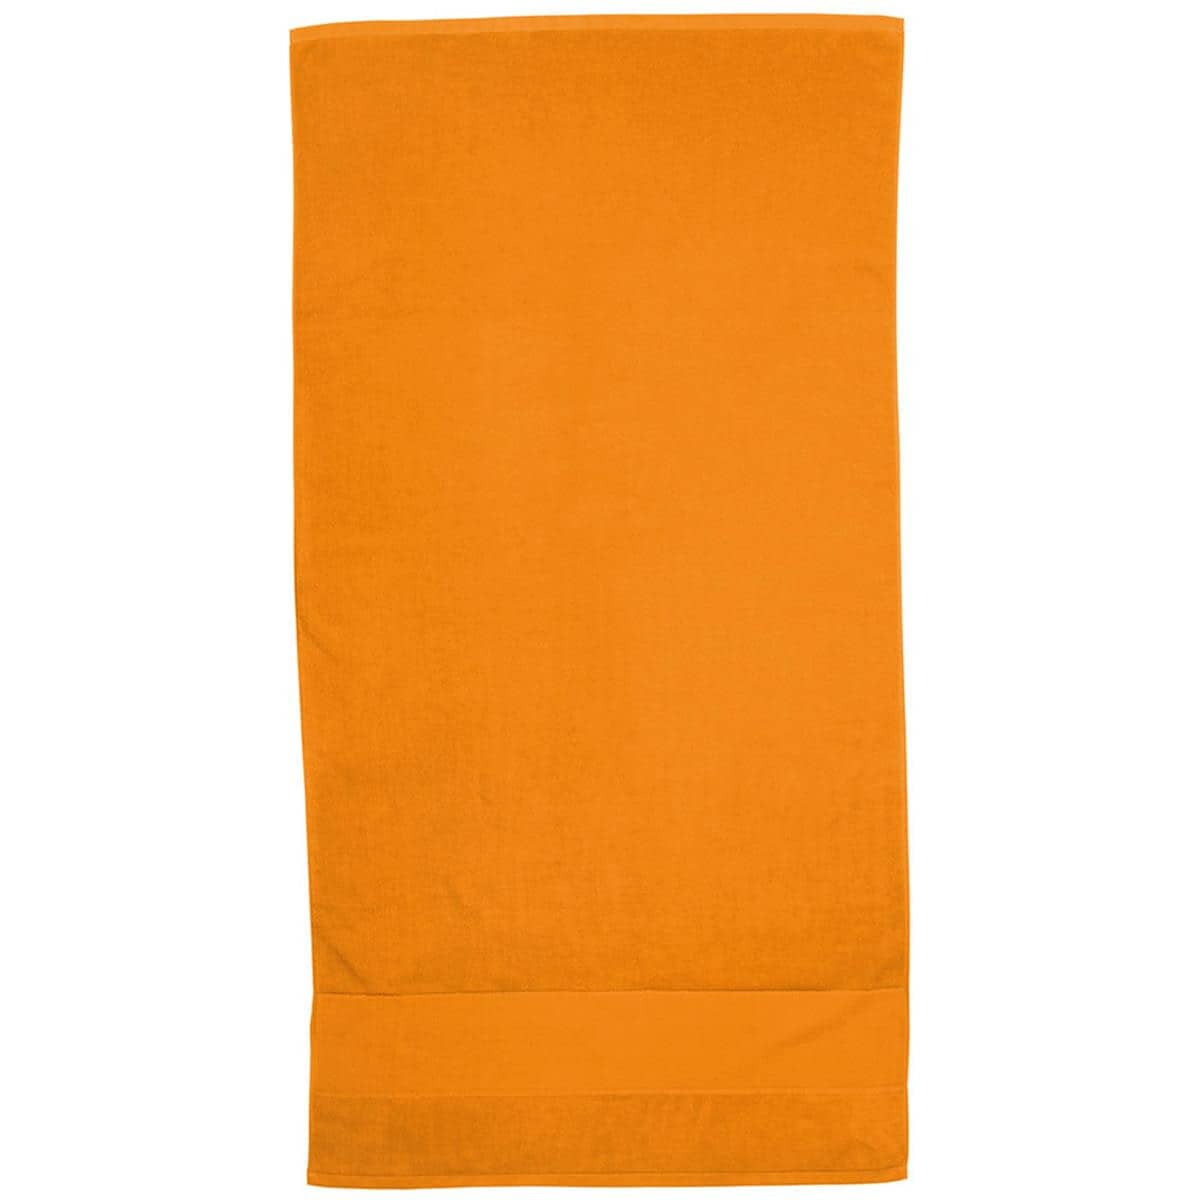 Orange Super Soft Touch Towel Custom Printed